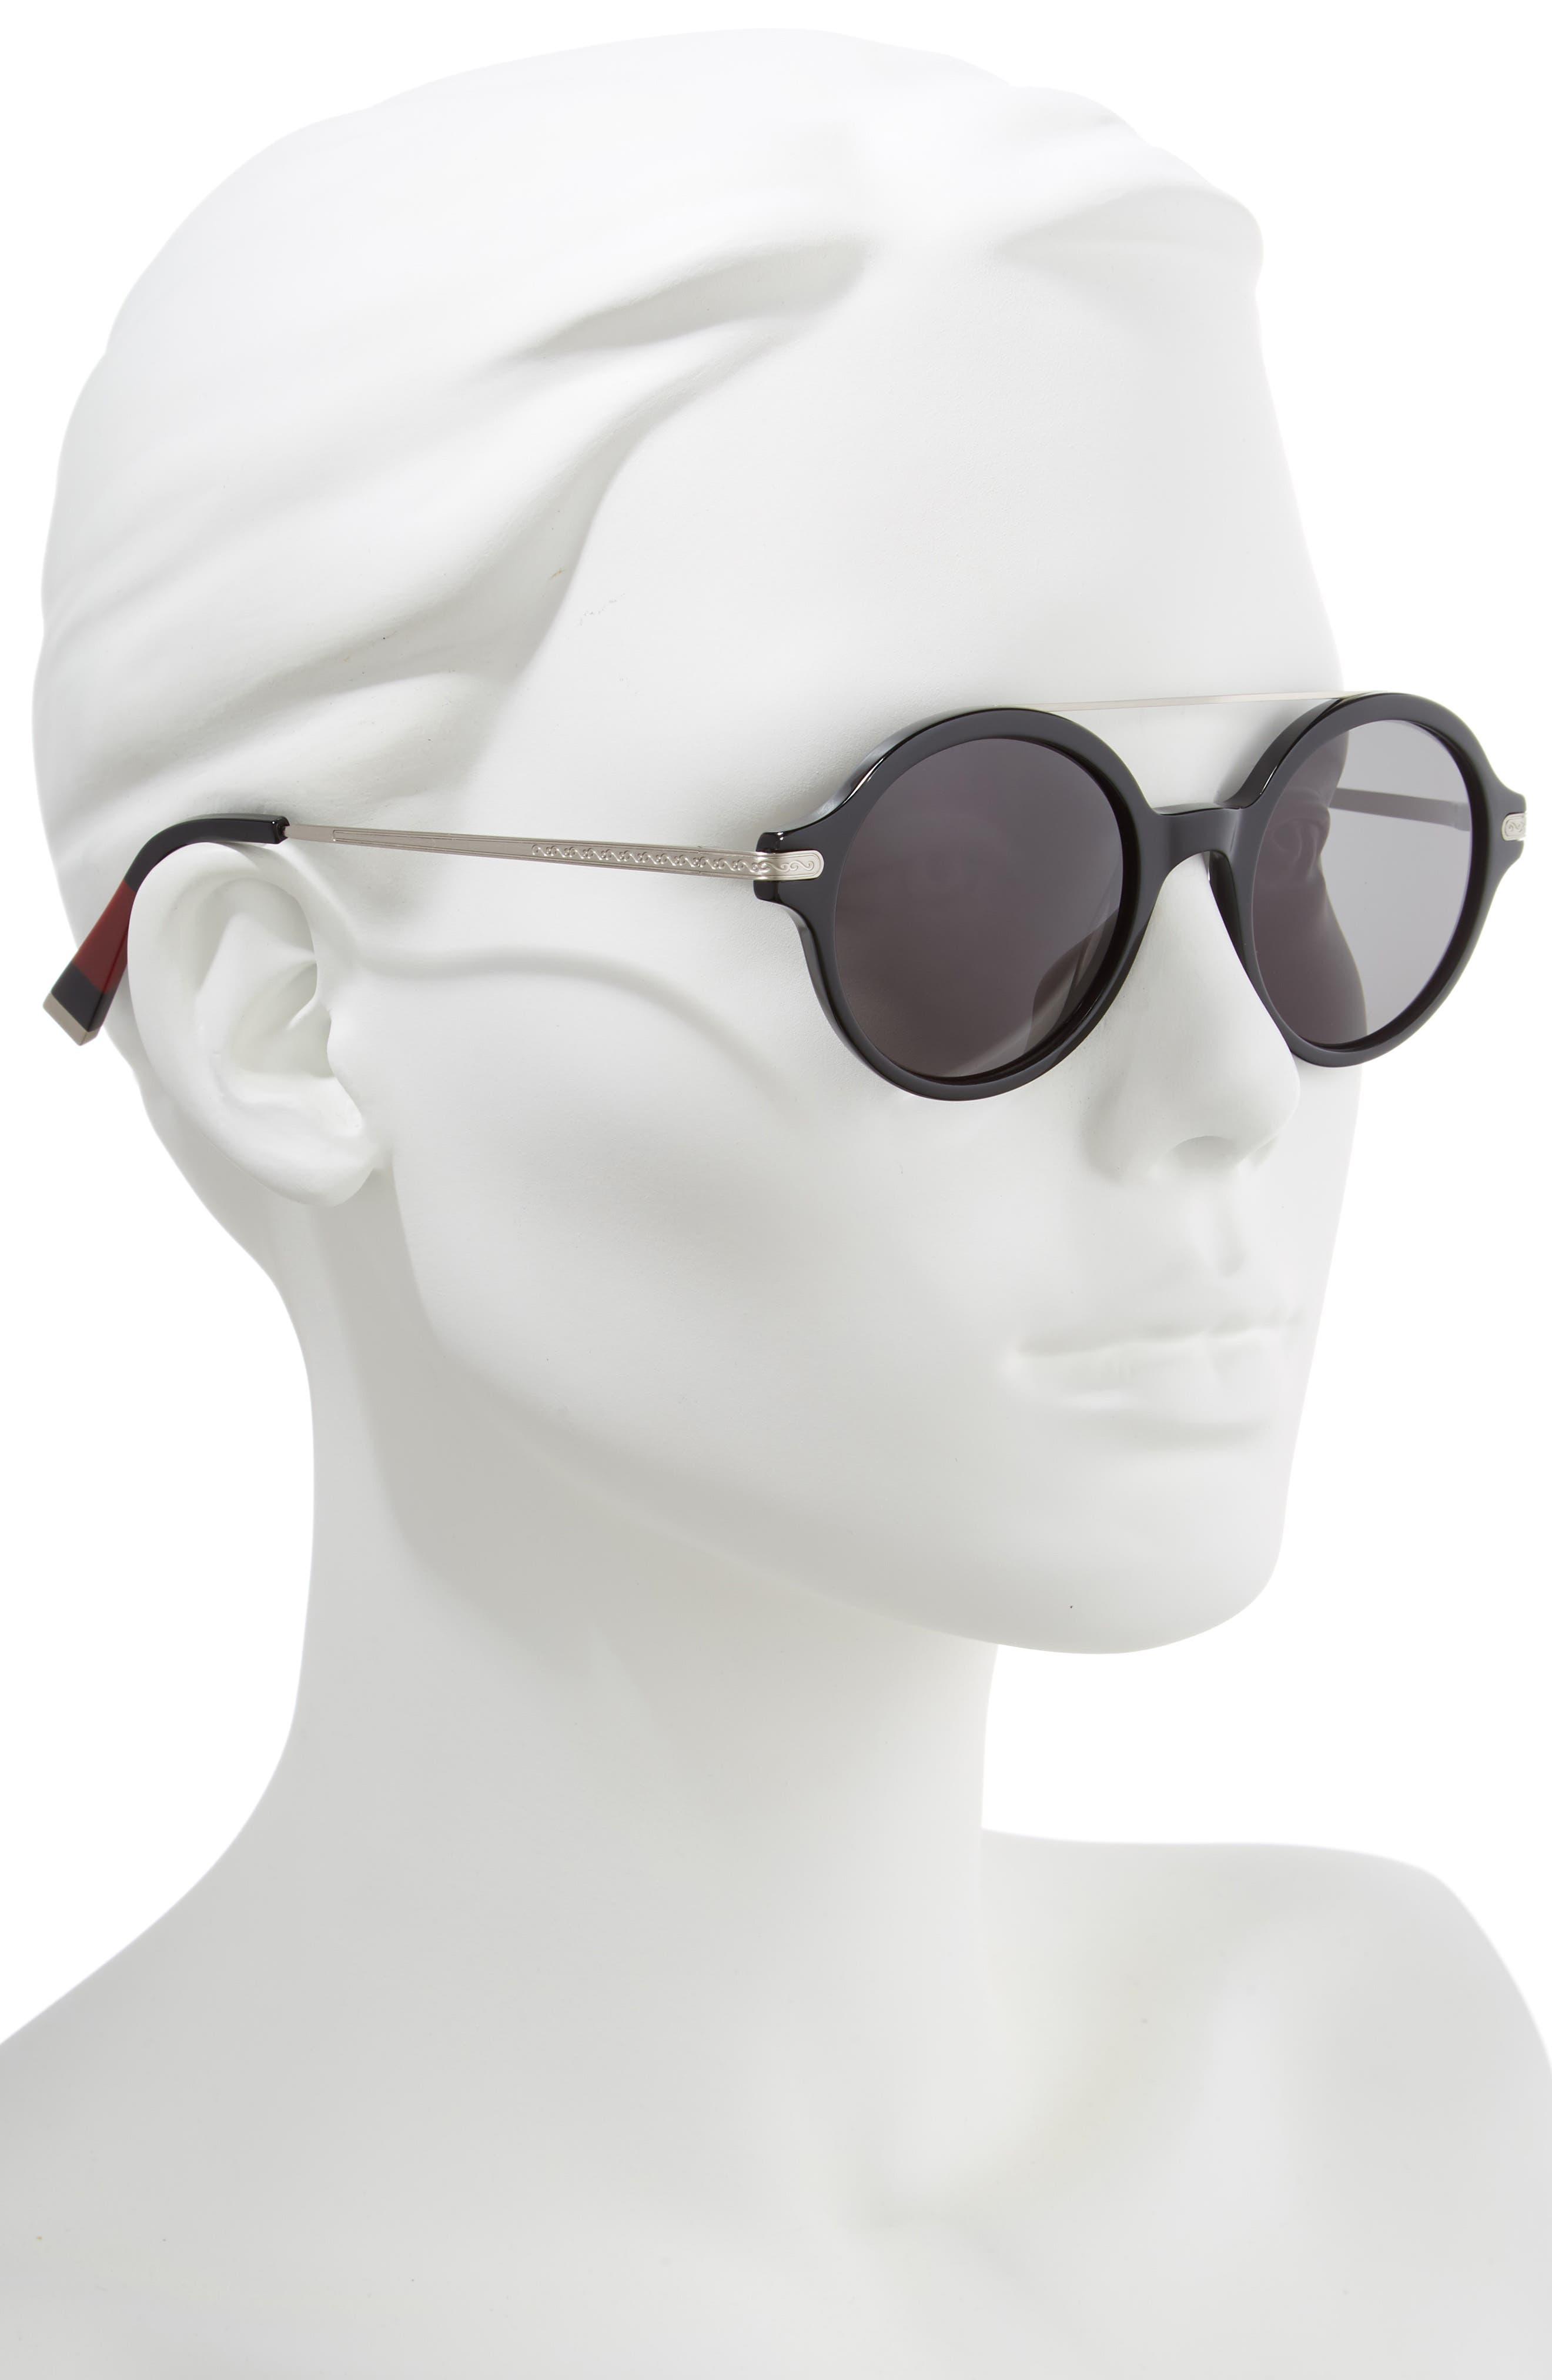 49mm Round Sunglasses,                             Alternate thumbnail 2, color,                             BLACK